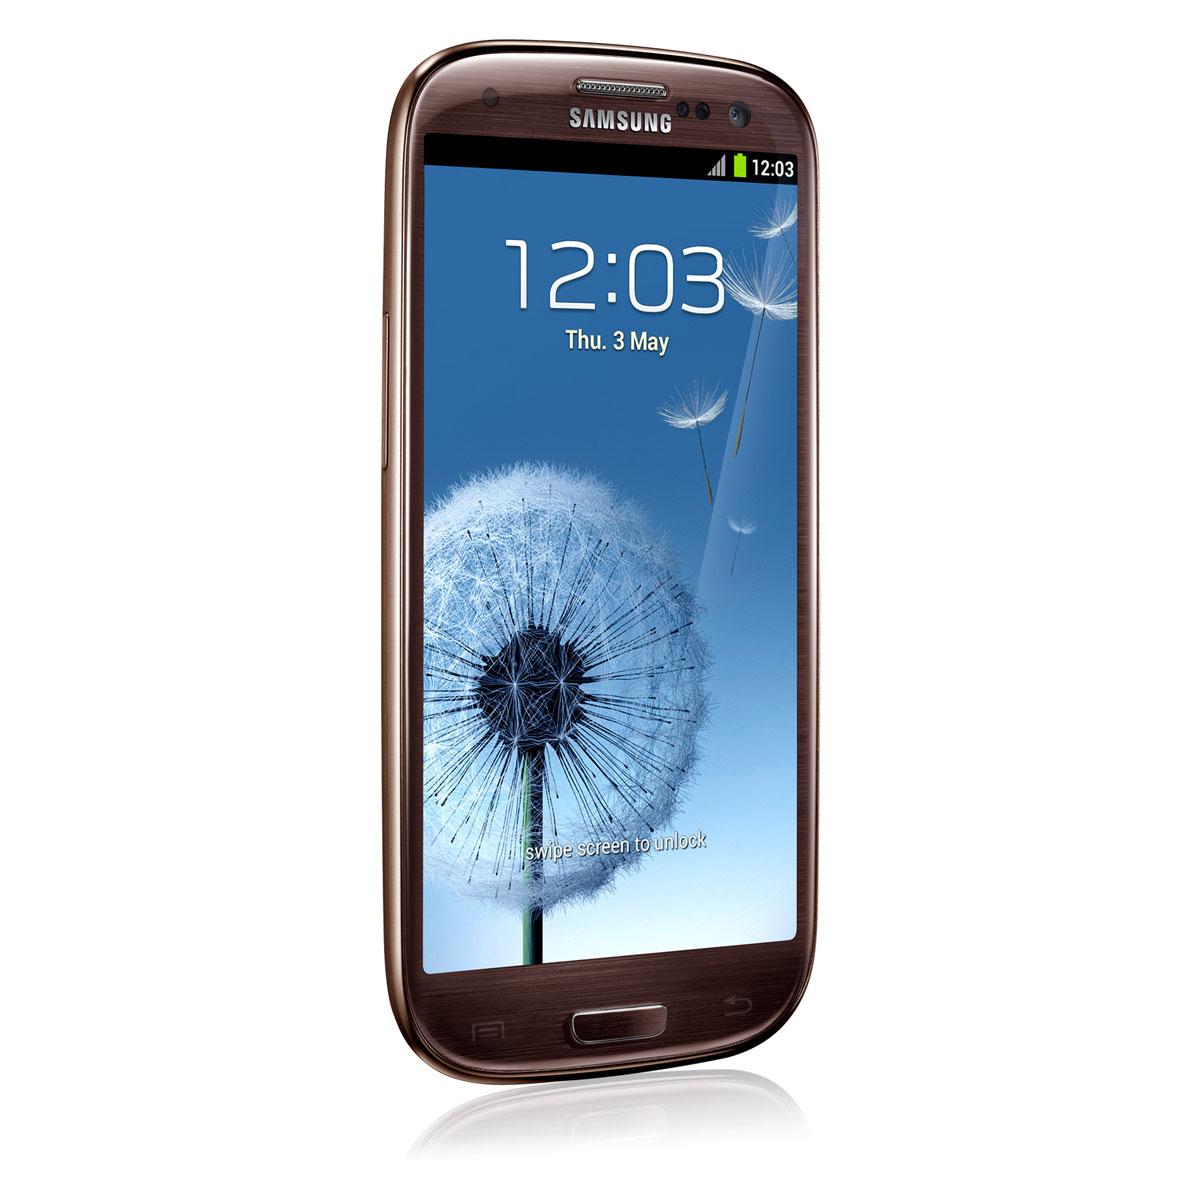 samsung galaxy siii 4g gt i9305 amber brown 16 go mobile. Black Bedroom Furniture Sets. Home Design Ideas